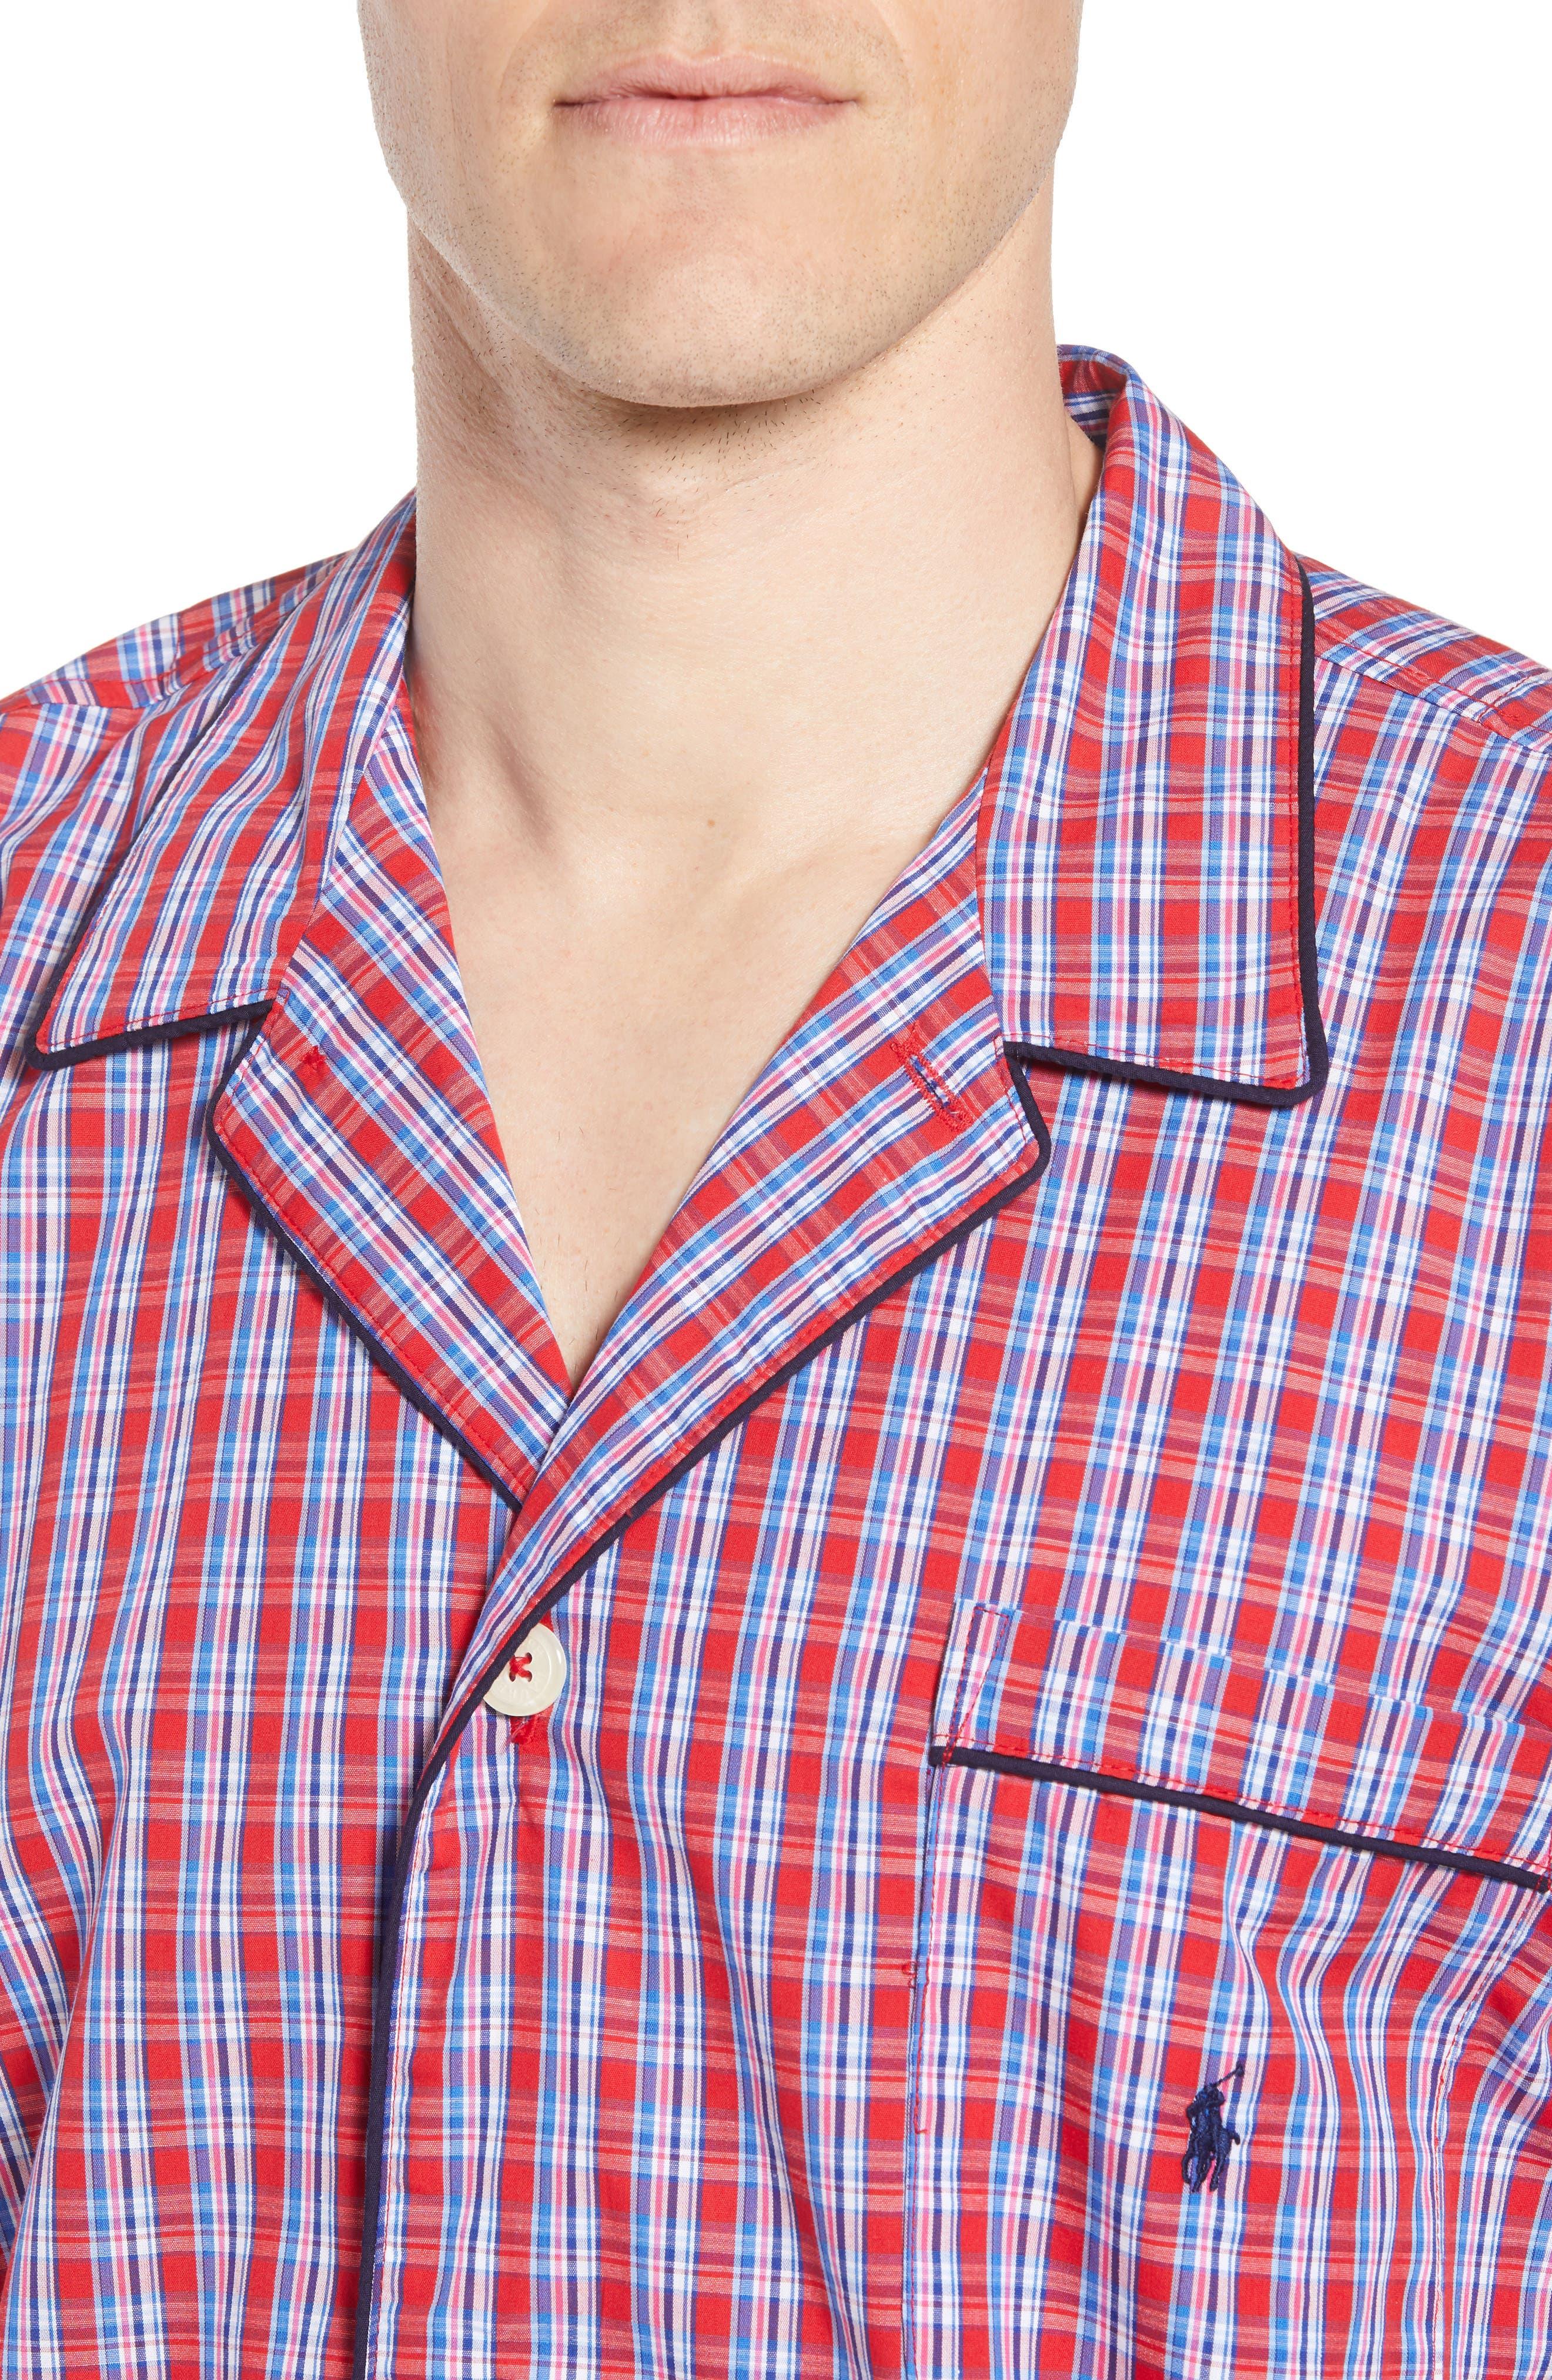 Cotton Pajama Shirt,                             Alternate thumbnail 4, color,                             NEWPORT PLAID/ NAVY